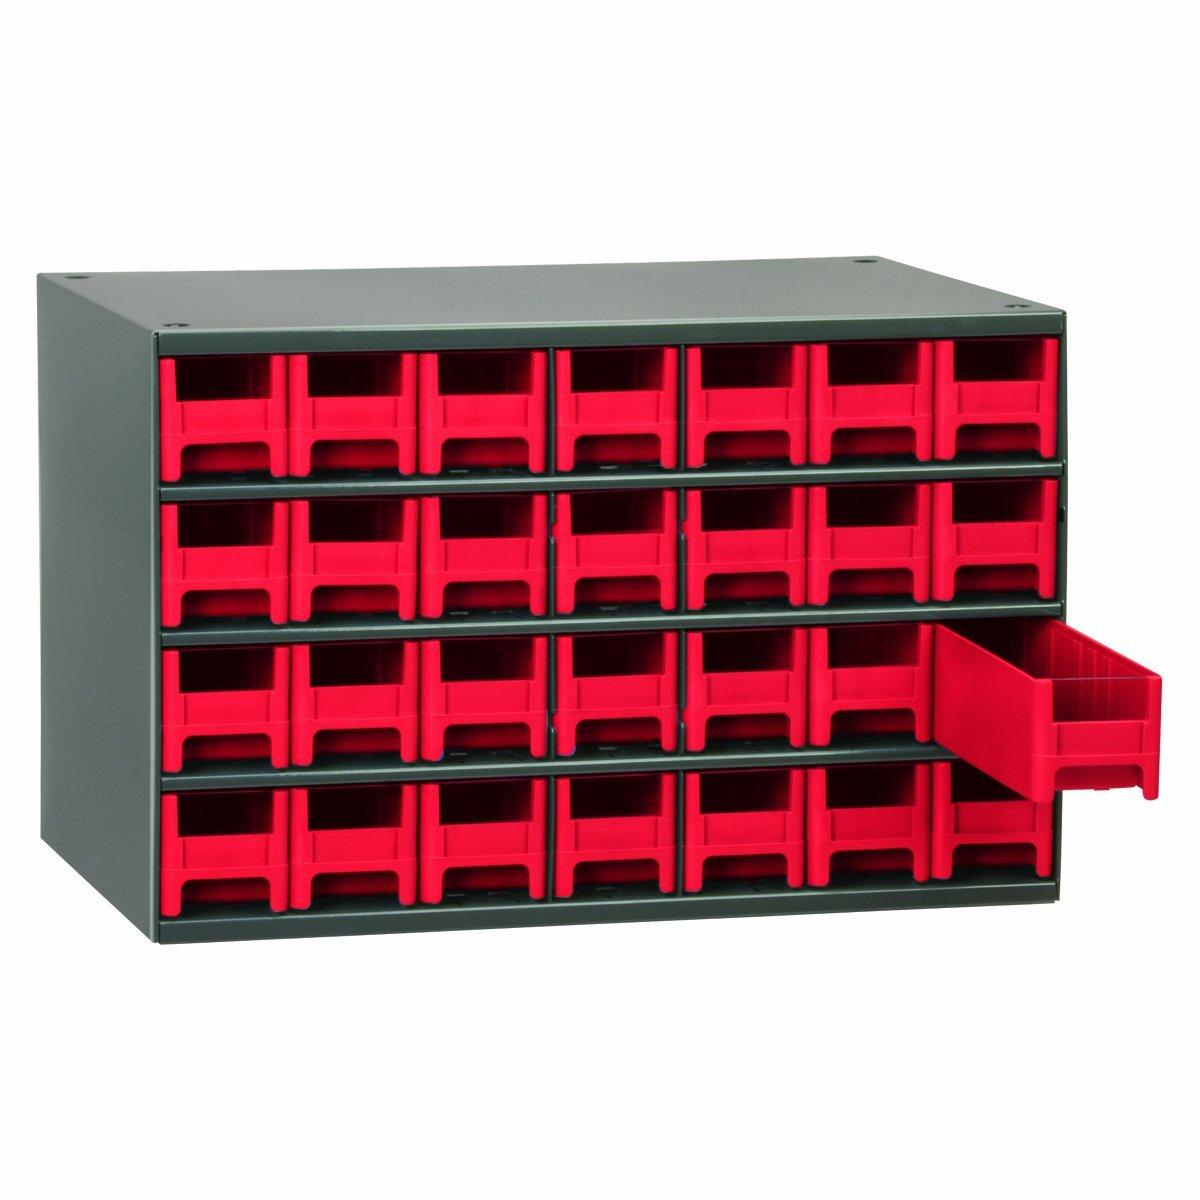 amazon com akro mils 19416 16 drawer steel parts storage hardware rh amazon com flambeau 6576nc hardware and craft parts cabinet storage drawer 30 drawers arts and craft cabinet hardware